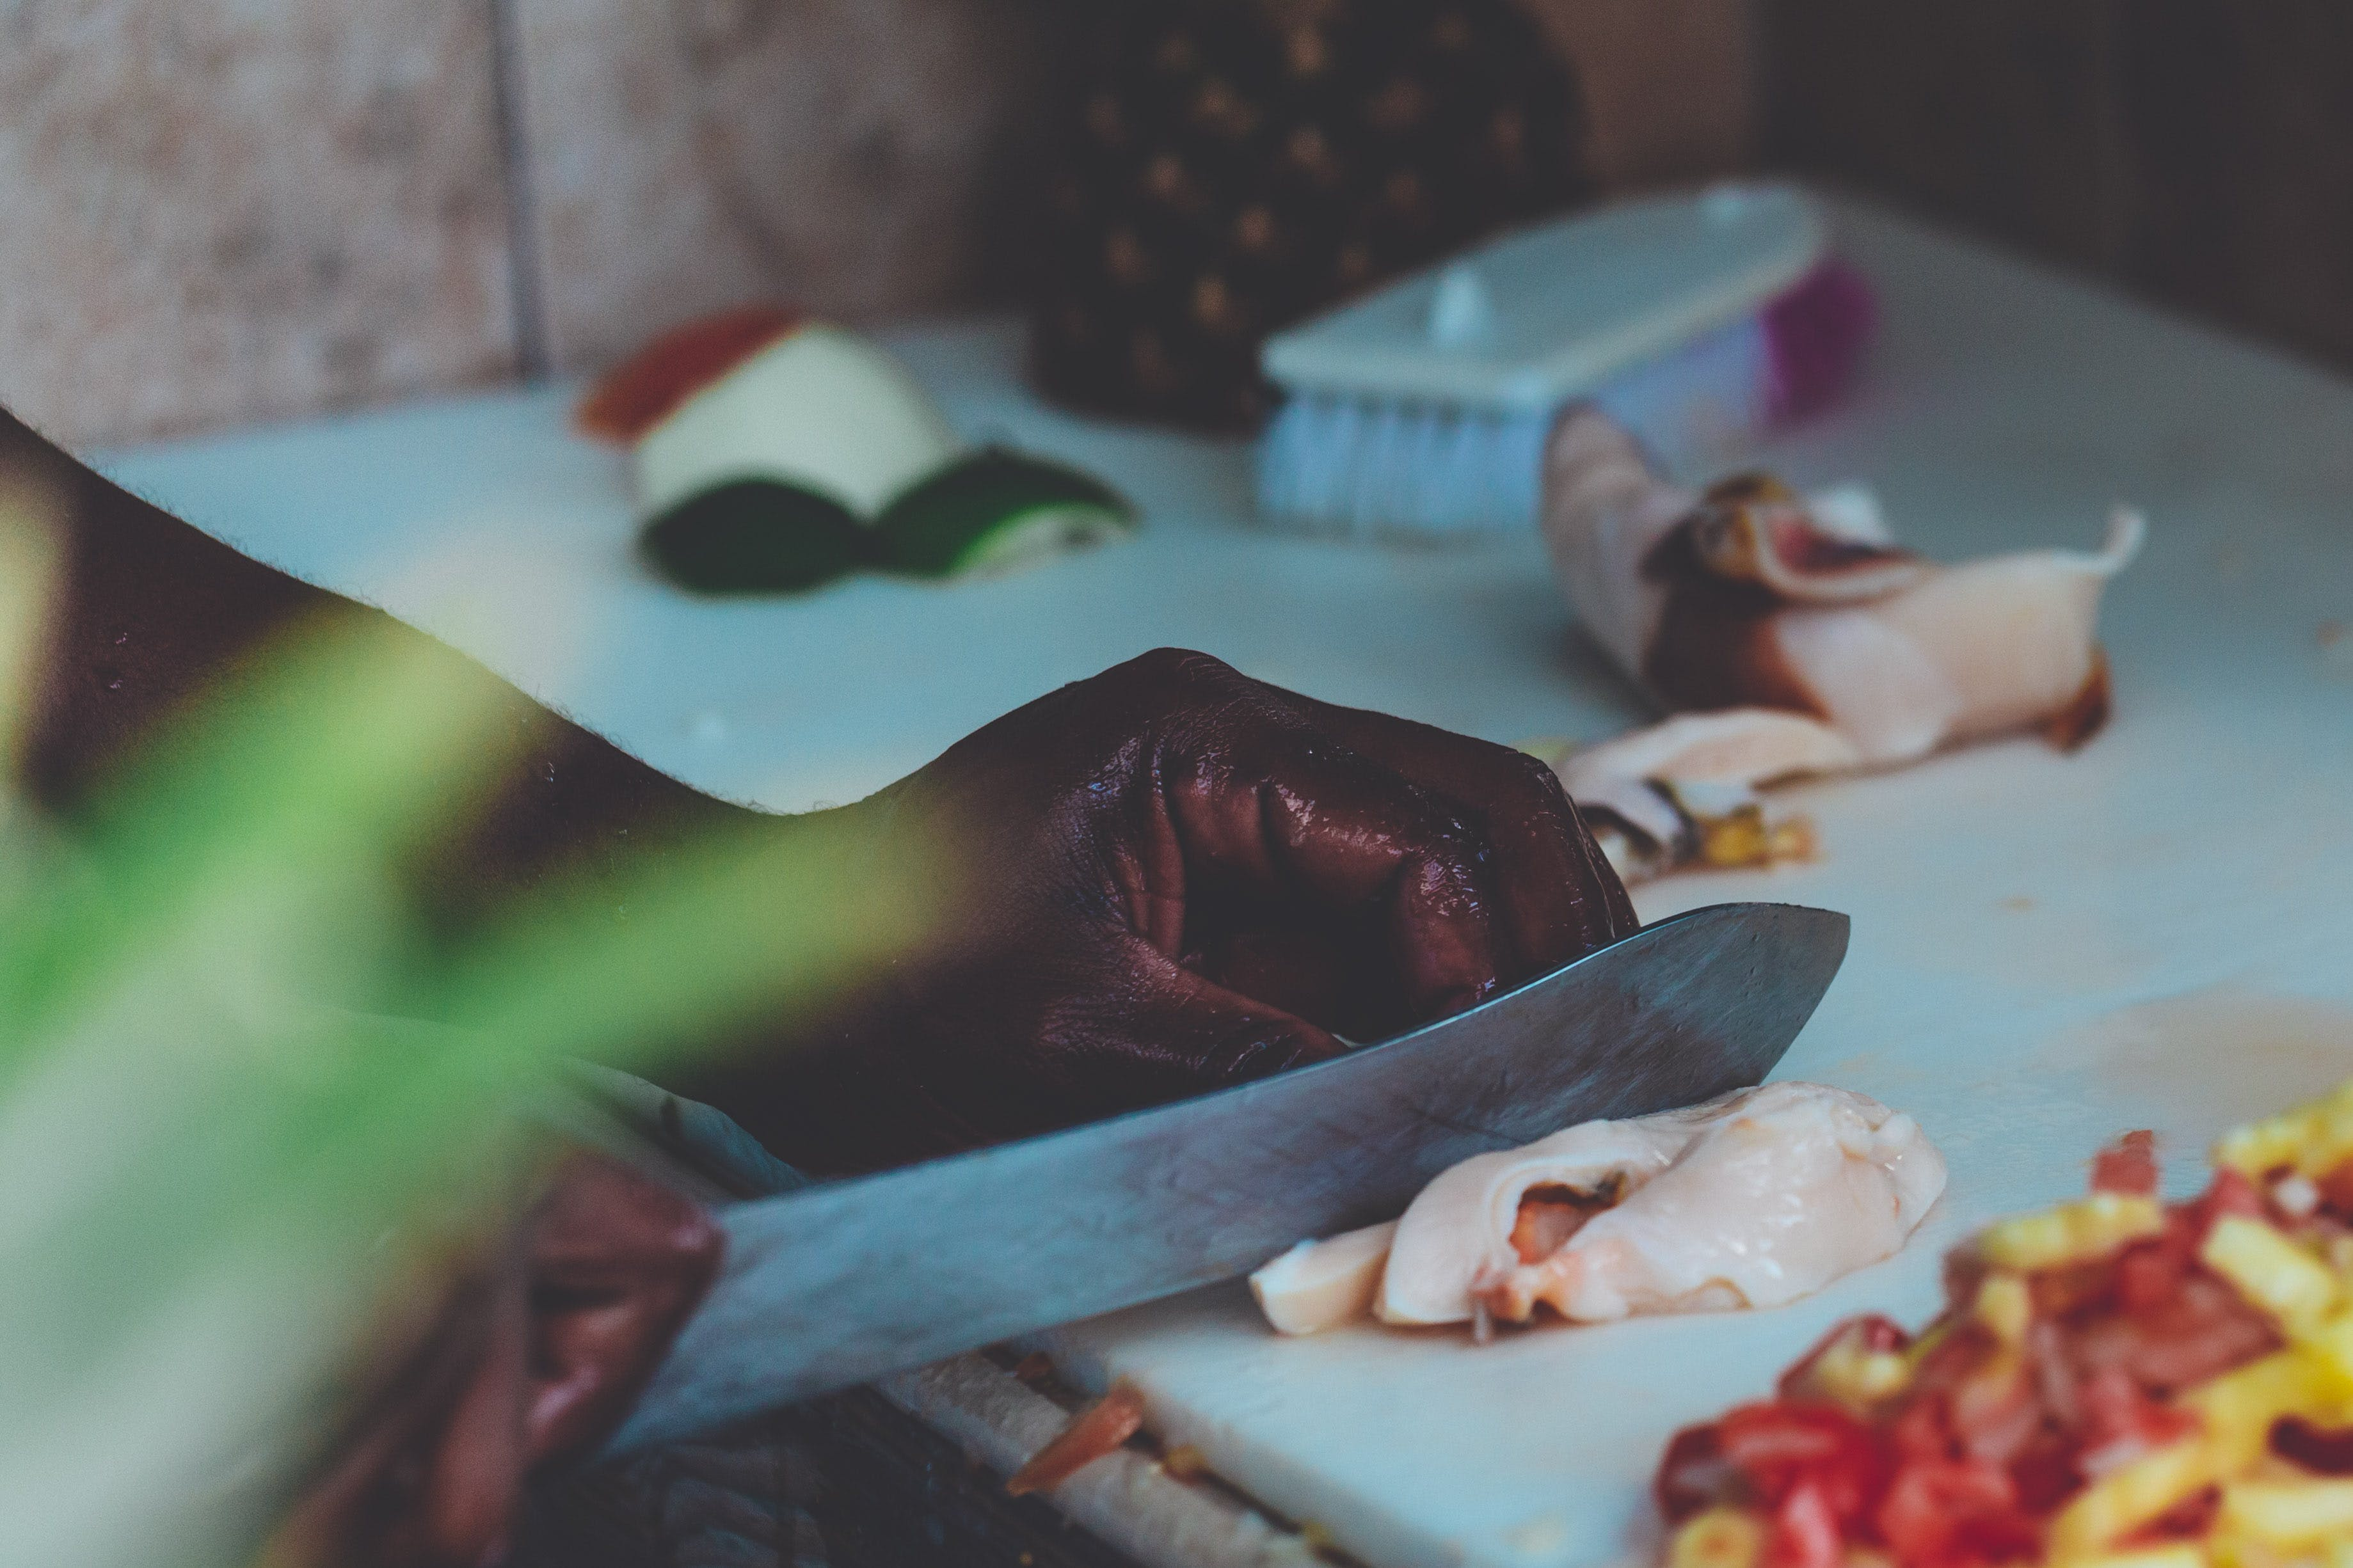 Kostenloses Stock Foto zu abendessen, bahamaisches essen, bahamas, bahamian